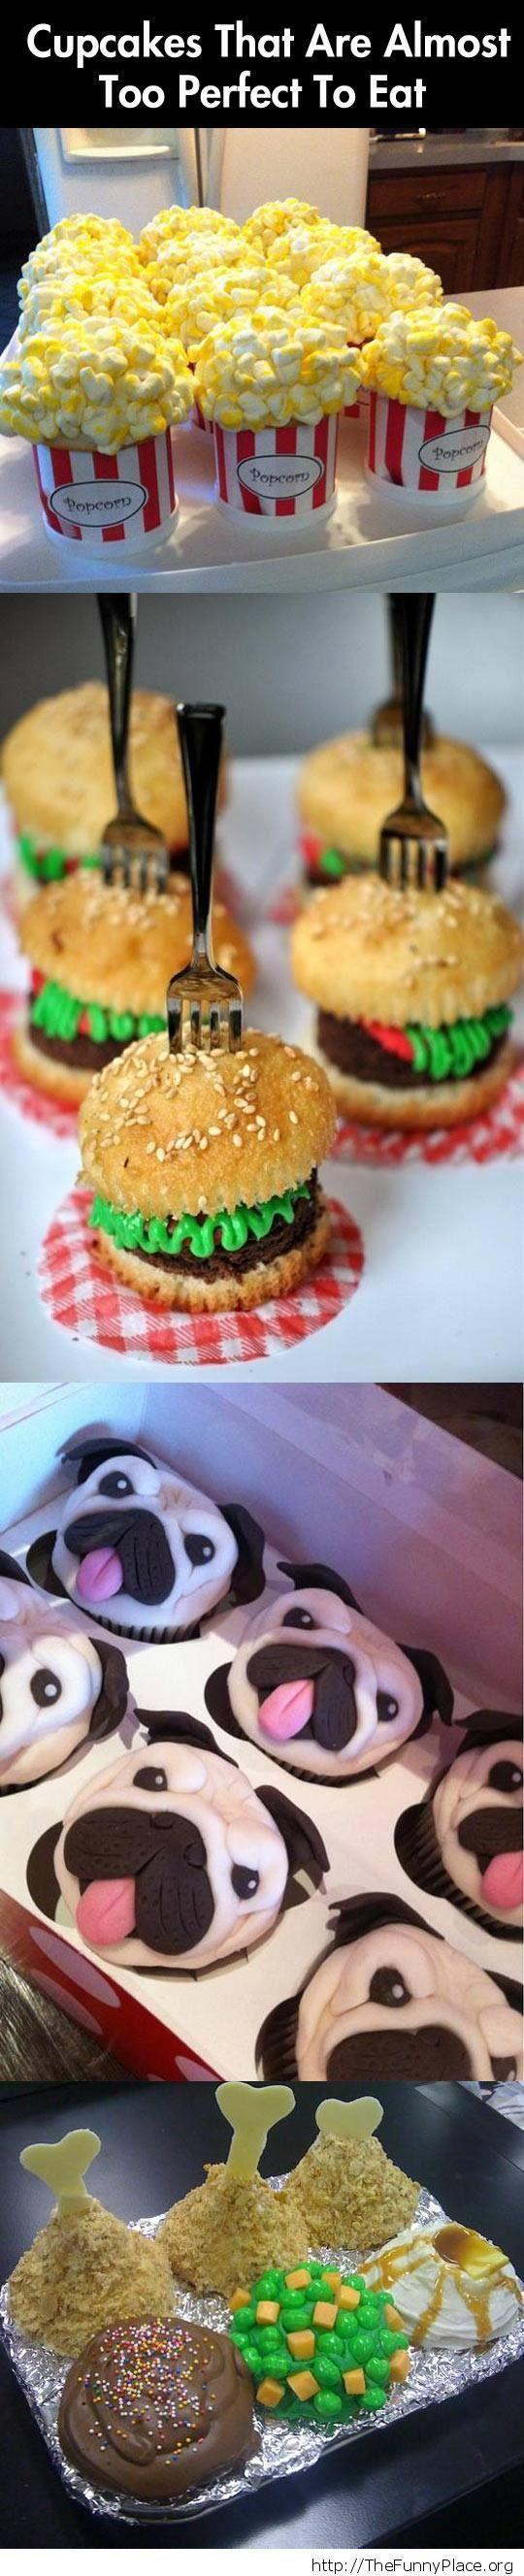 Cool Cupcake art (Cool Art Fun)